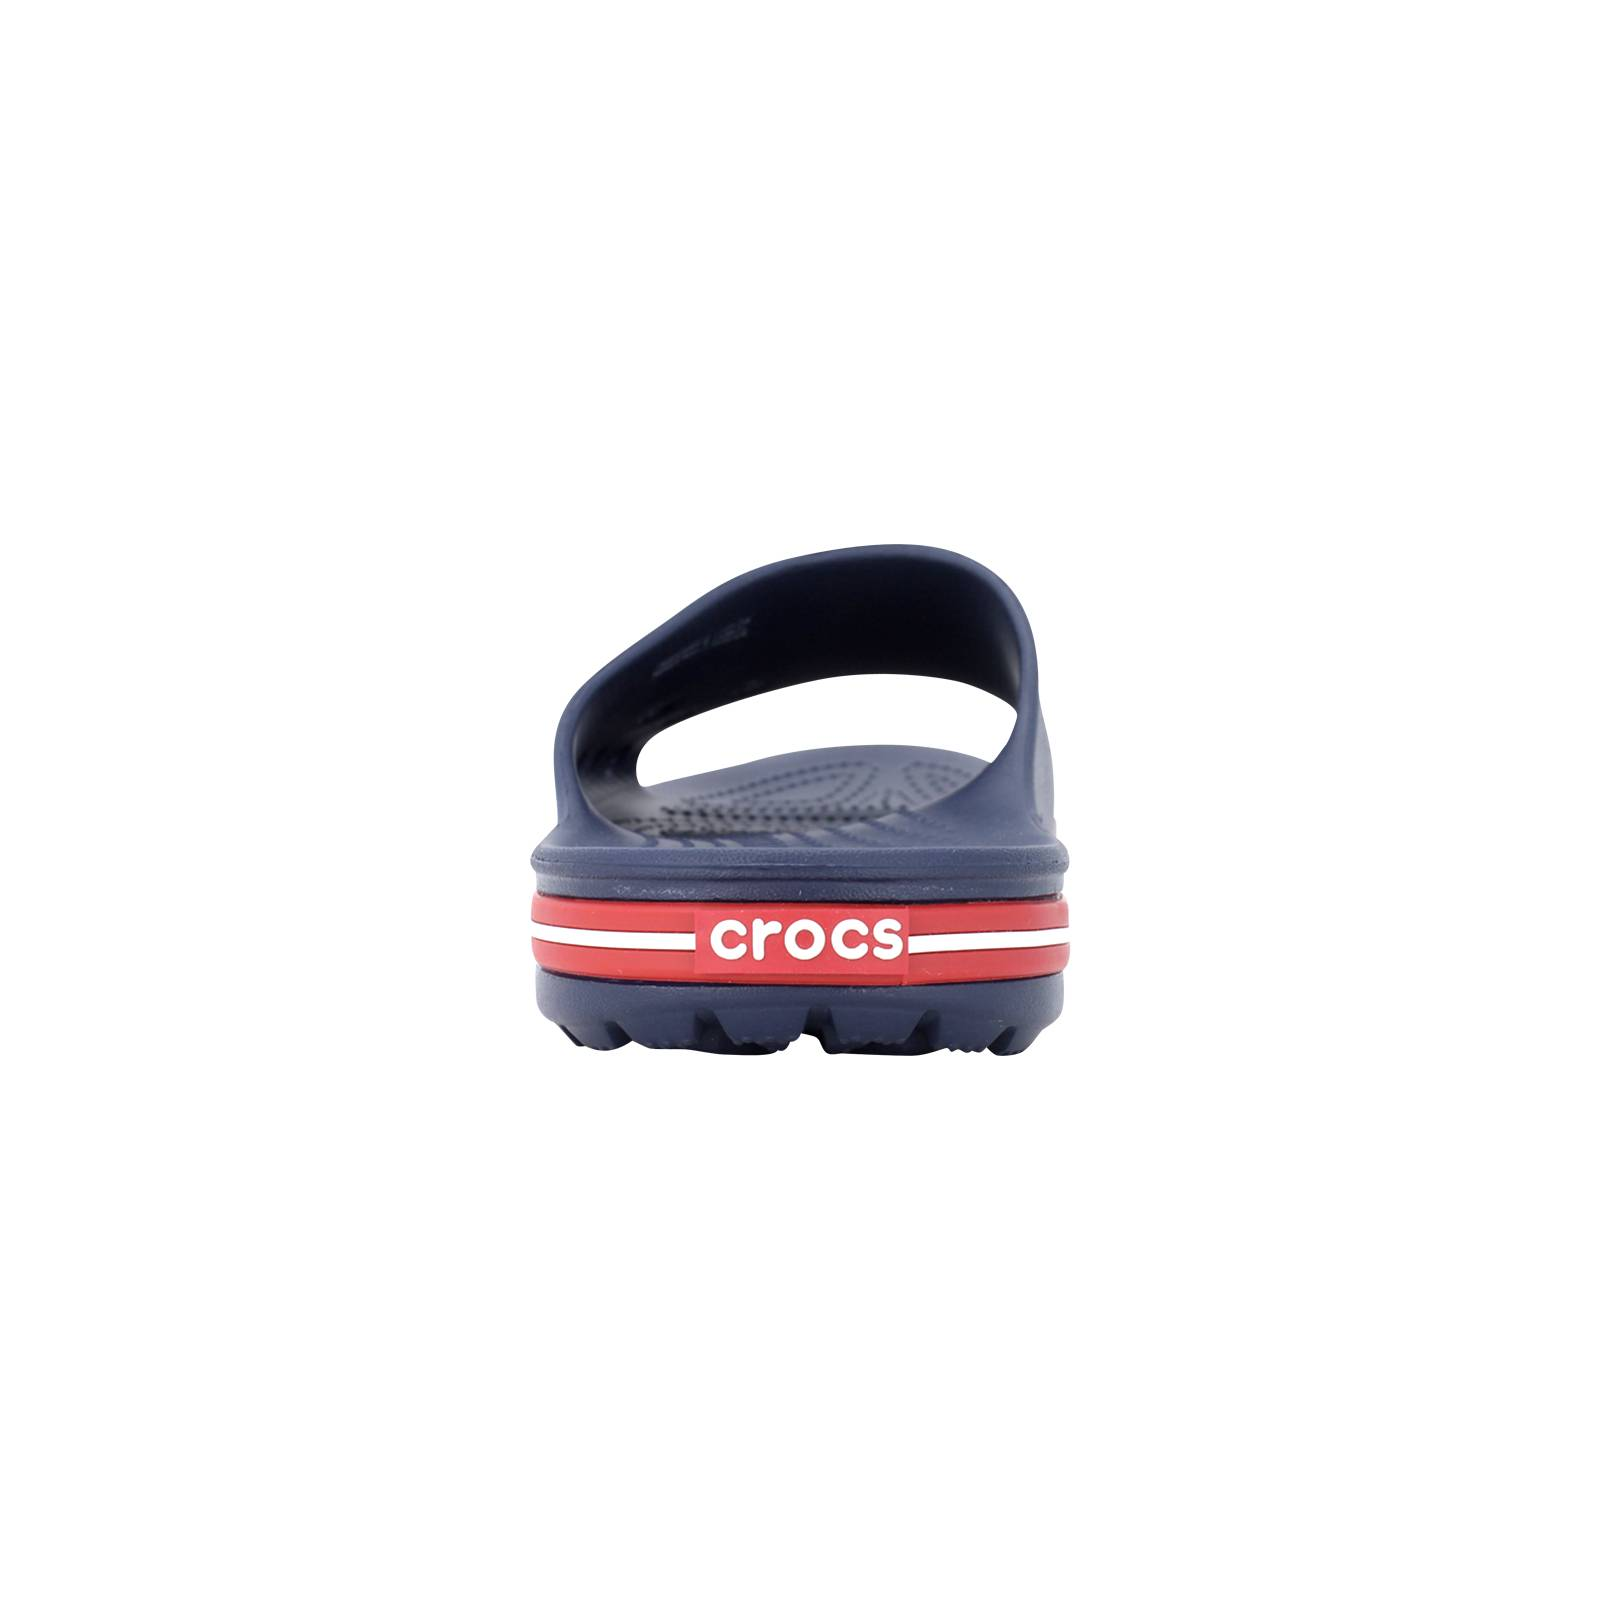 70e13c0a5 Crocband II Slide - Crocs Men s sandals made of croslite - Gianna ...